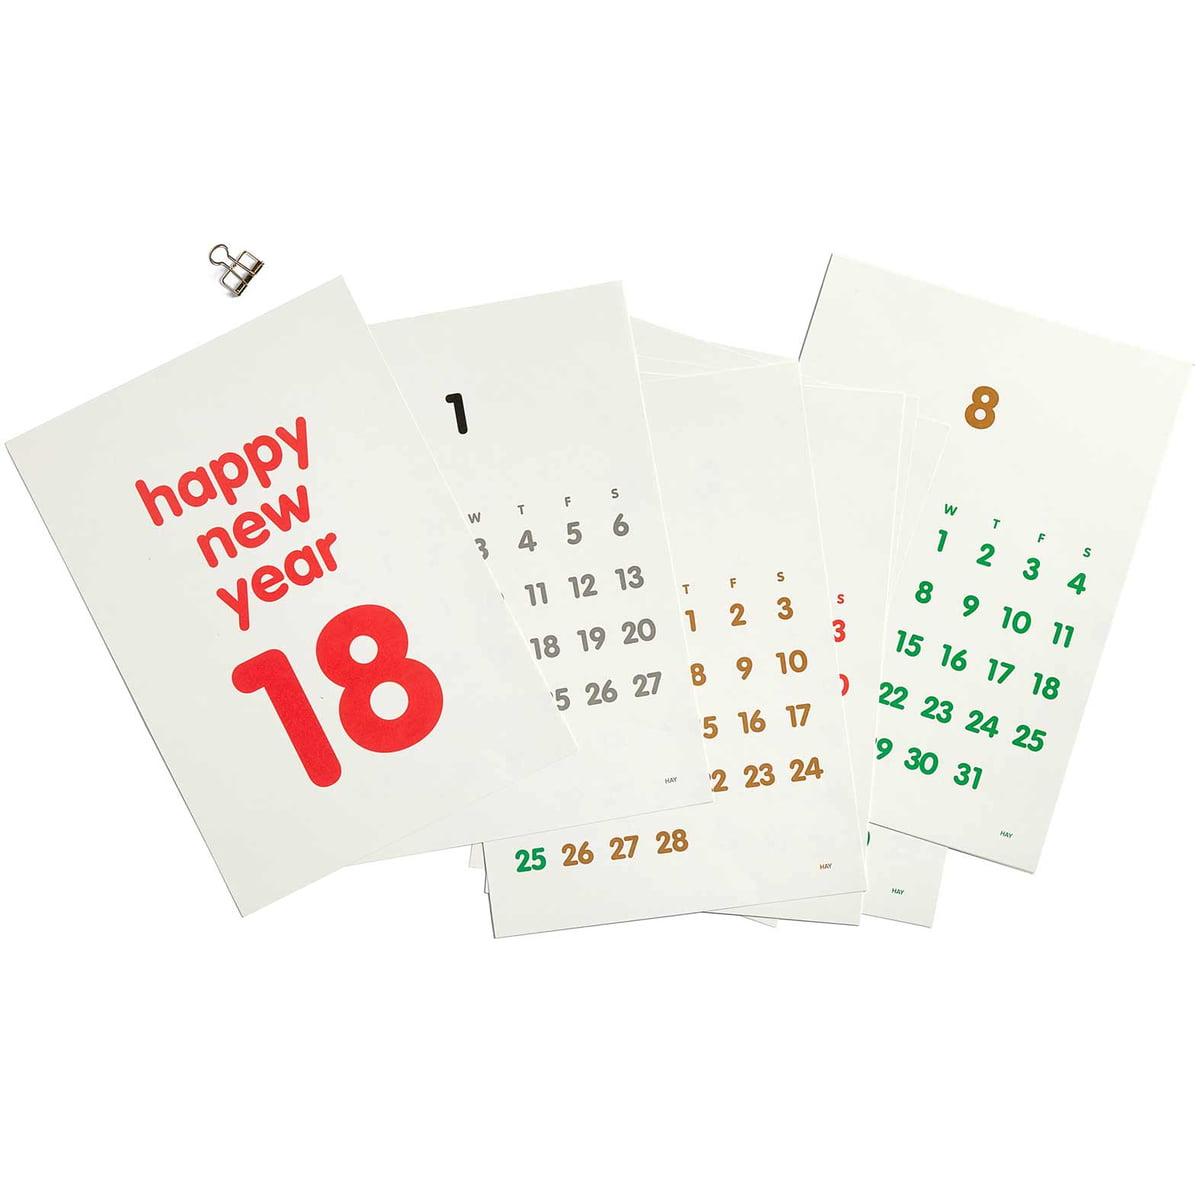 clip kalender 2018 von hay connox shop. Black Bedroom Furniture Sets. Home Design Ideas